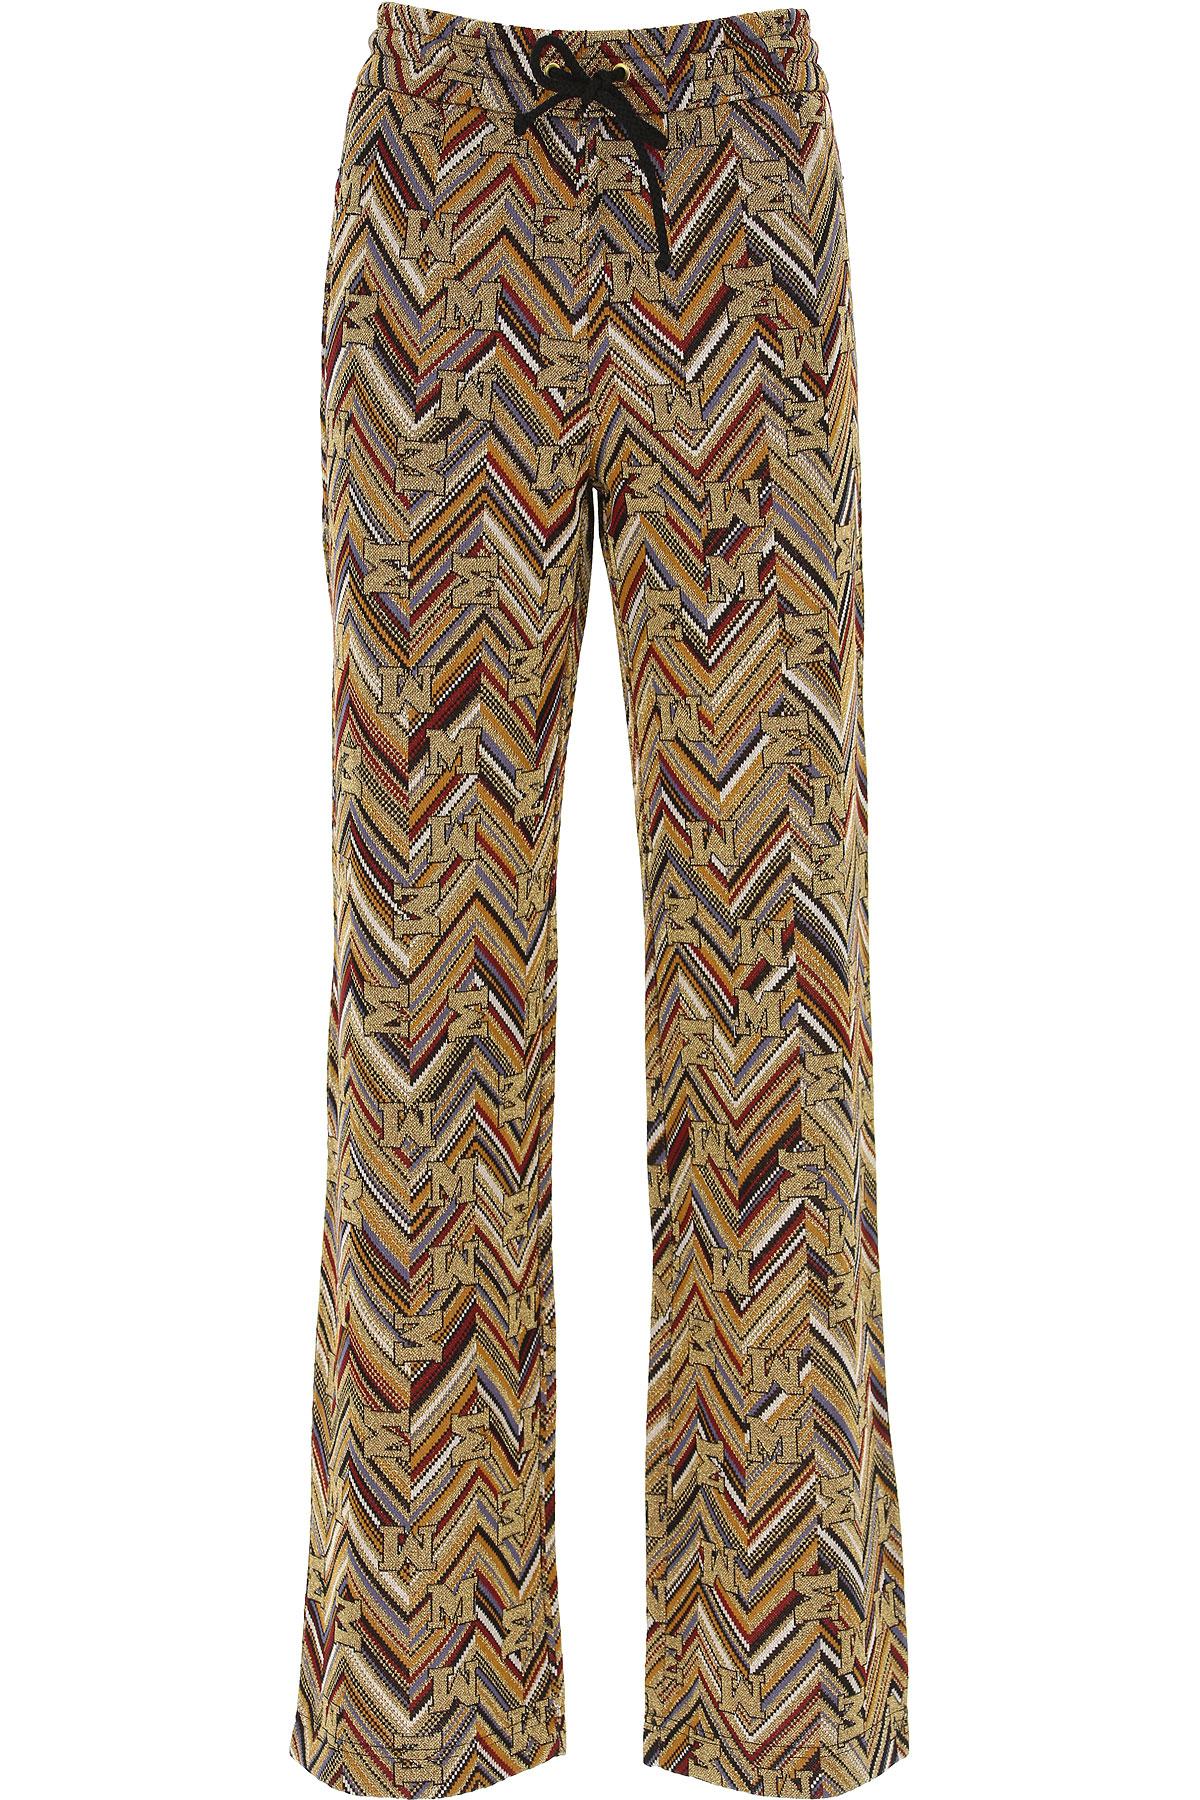 Missoni Pants for Women On Sale, Gold, Viscose, 2019, S (IT 40) M (IT 42 ) XS (IT 38)